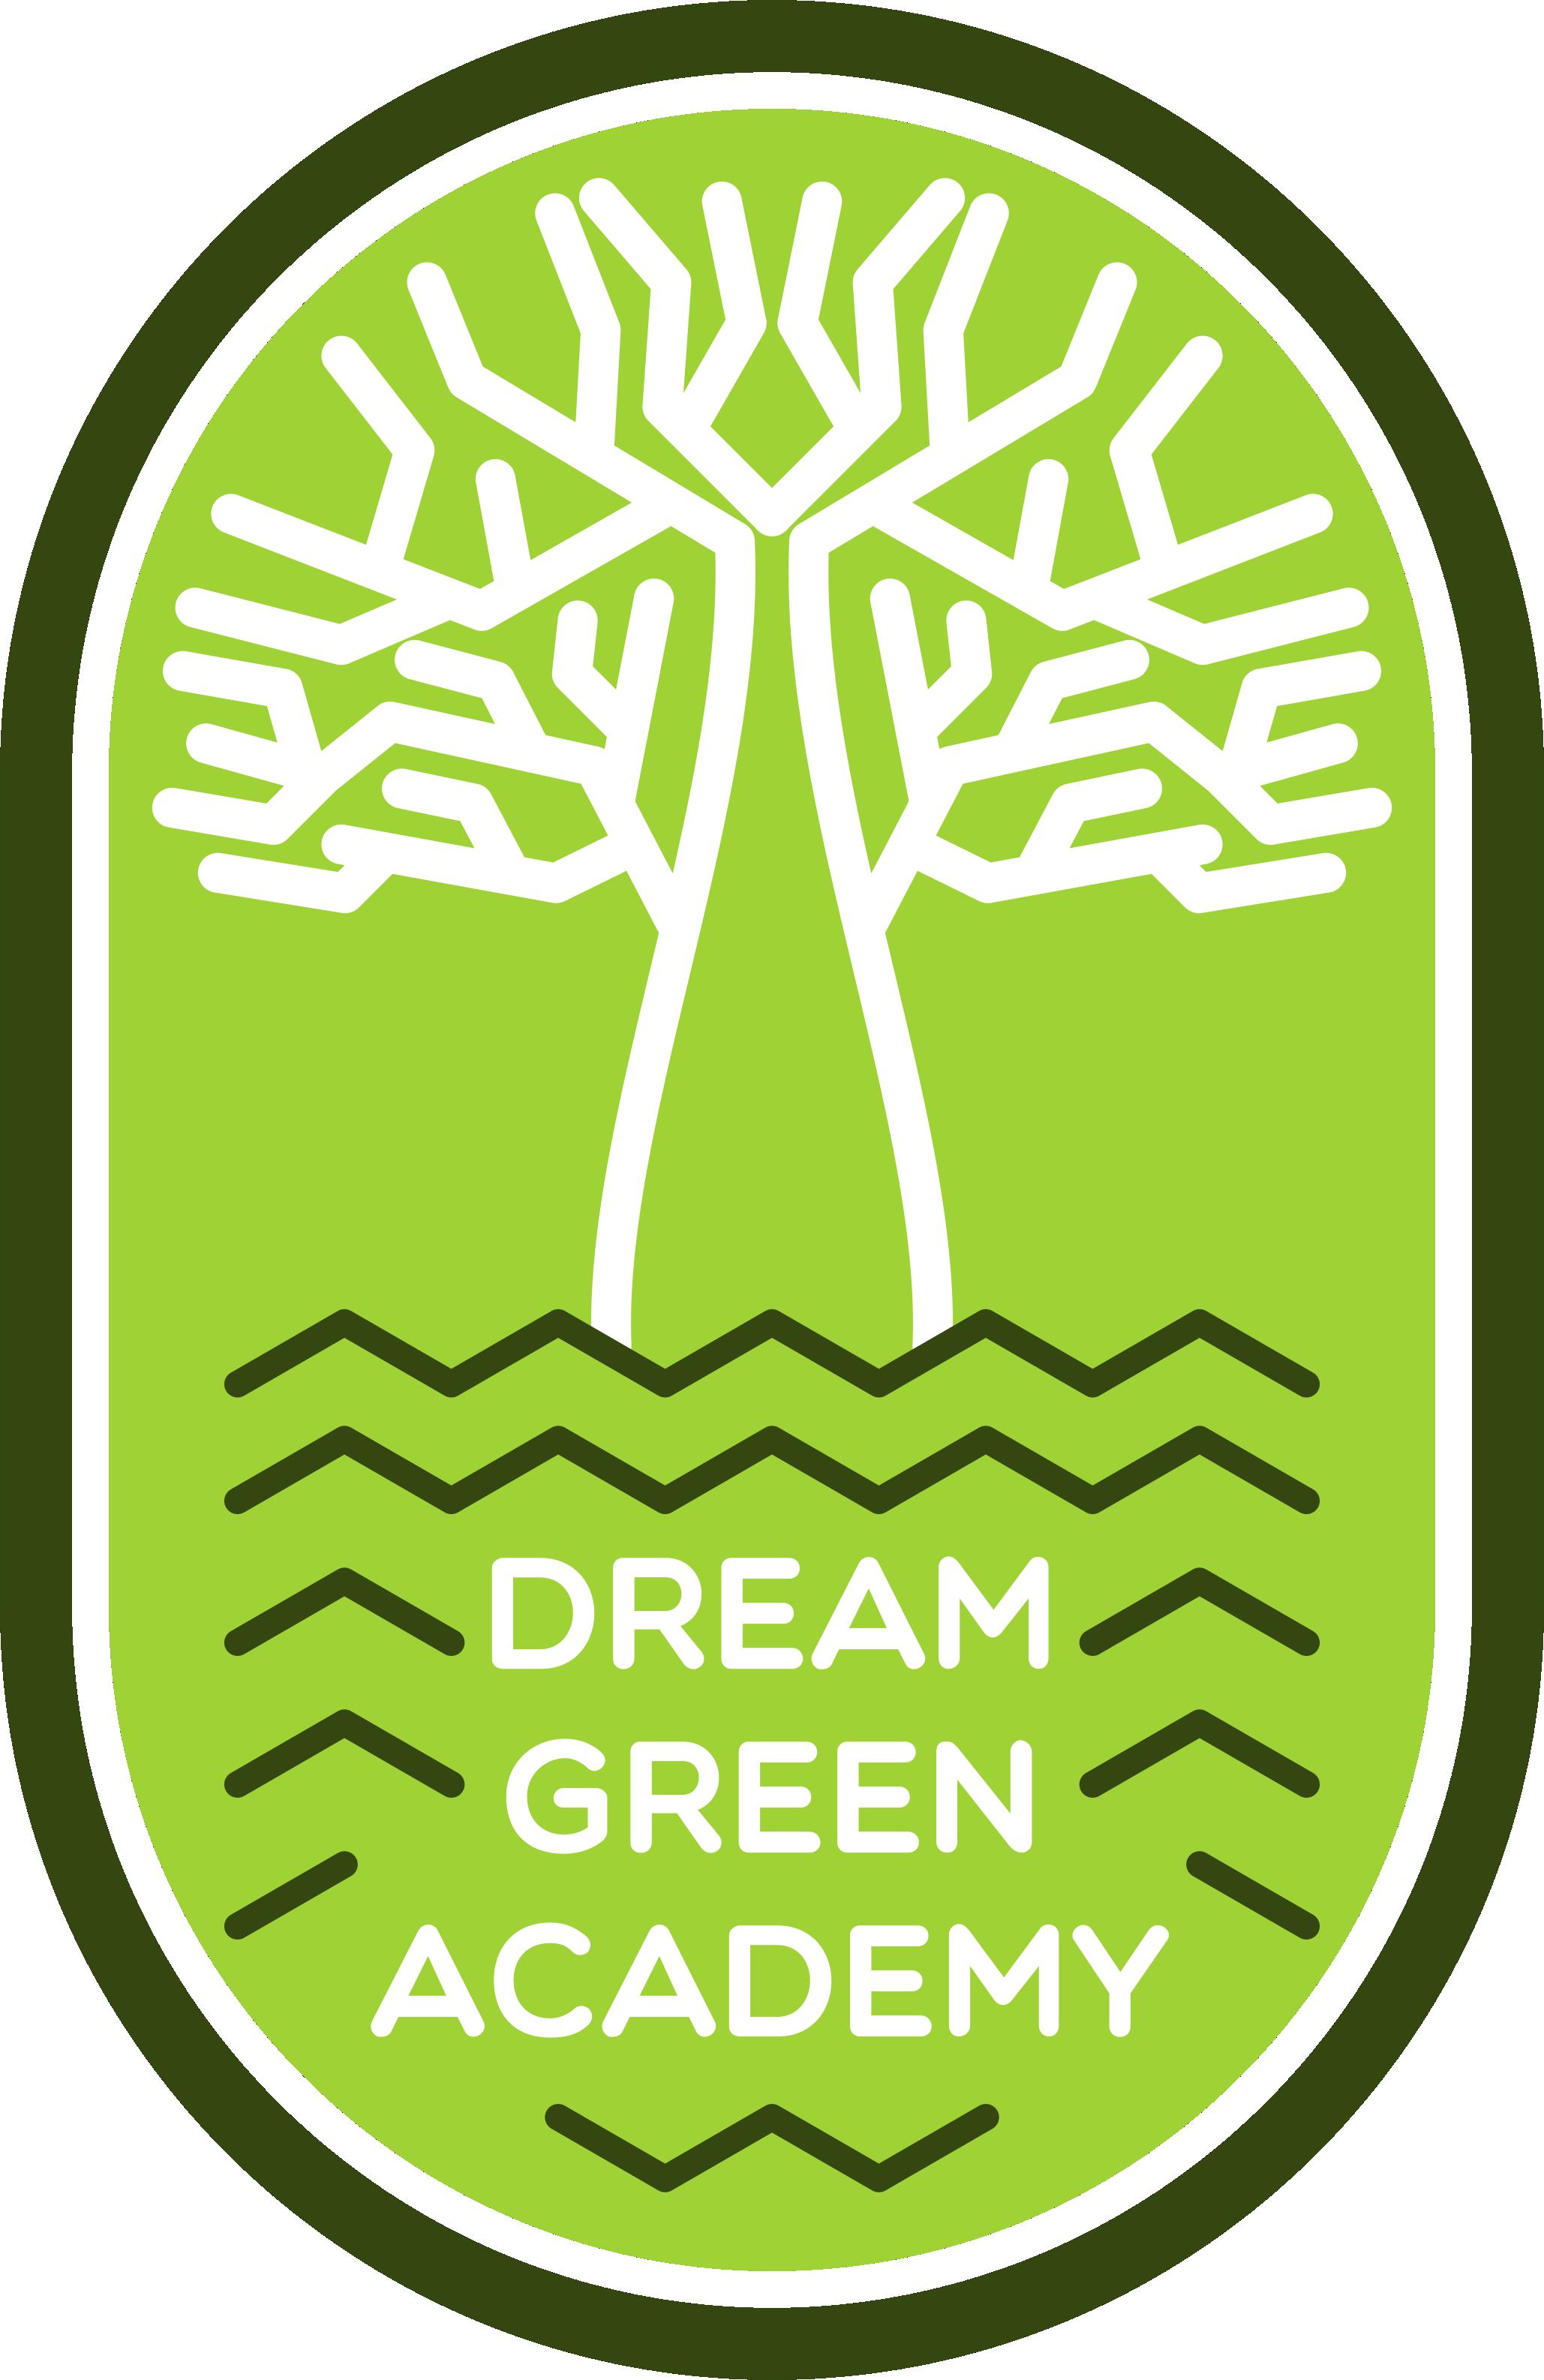 DREAM GREEN ACADEMY - LOGO.png